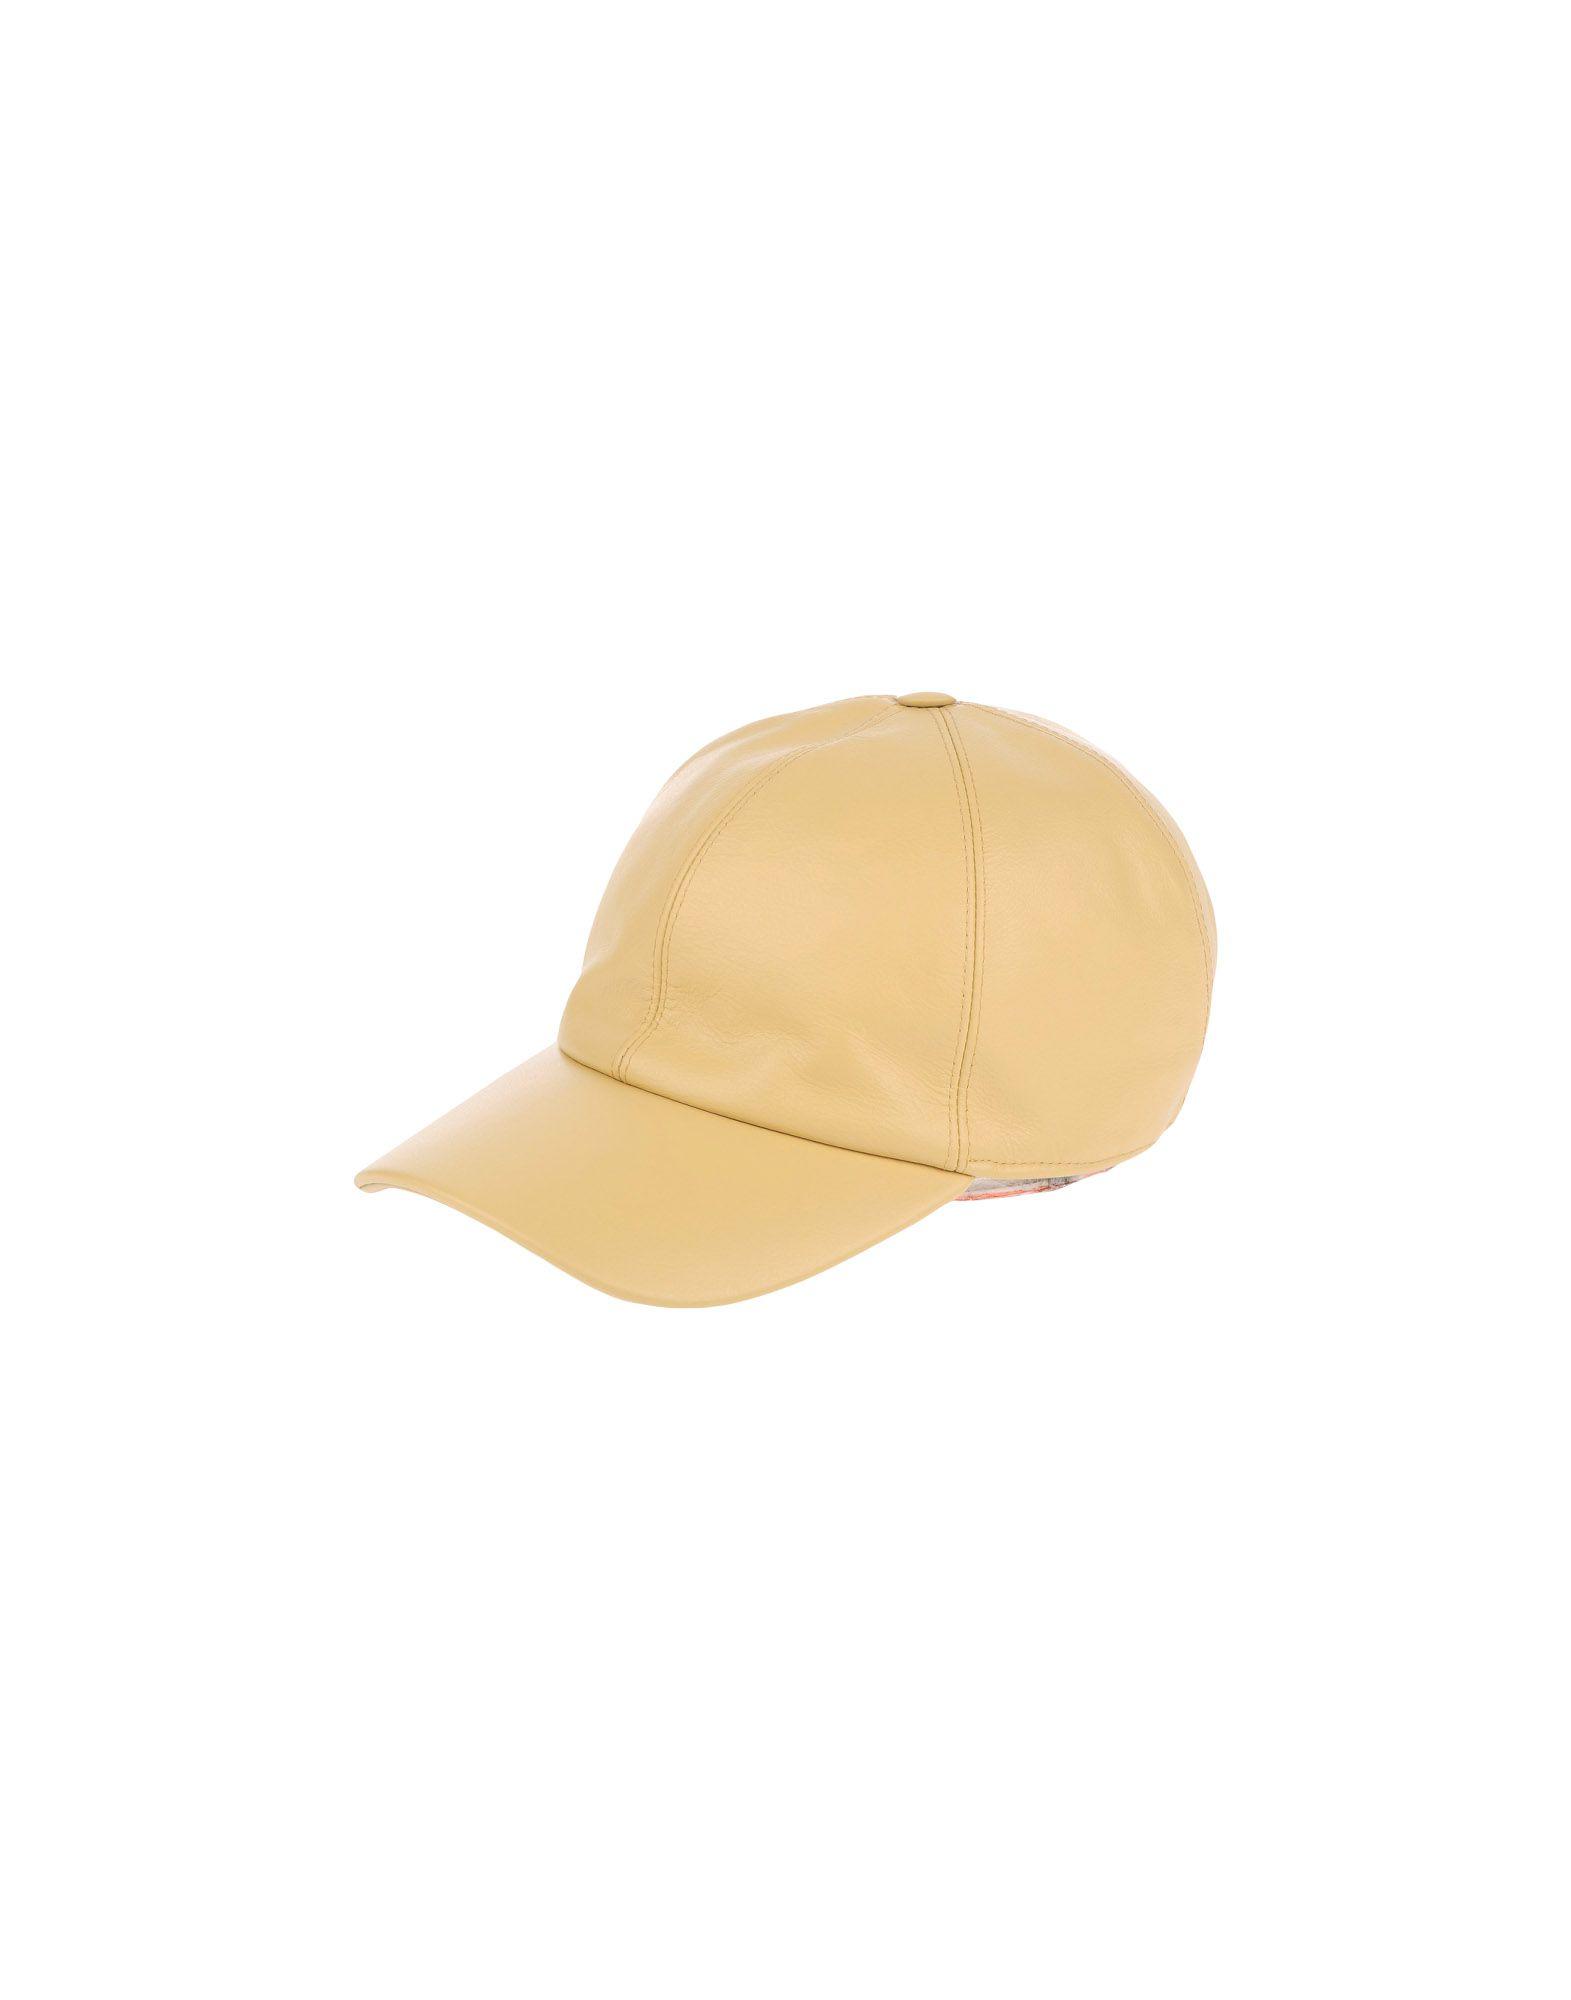 ACCESSORIES - Hats Umit Benan T8vX3rWGv